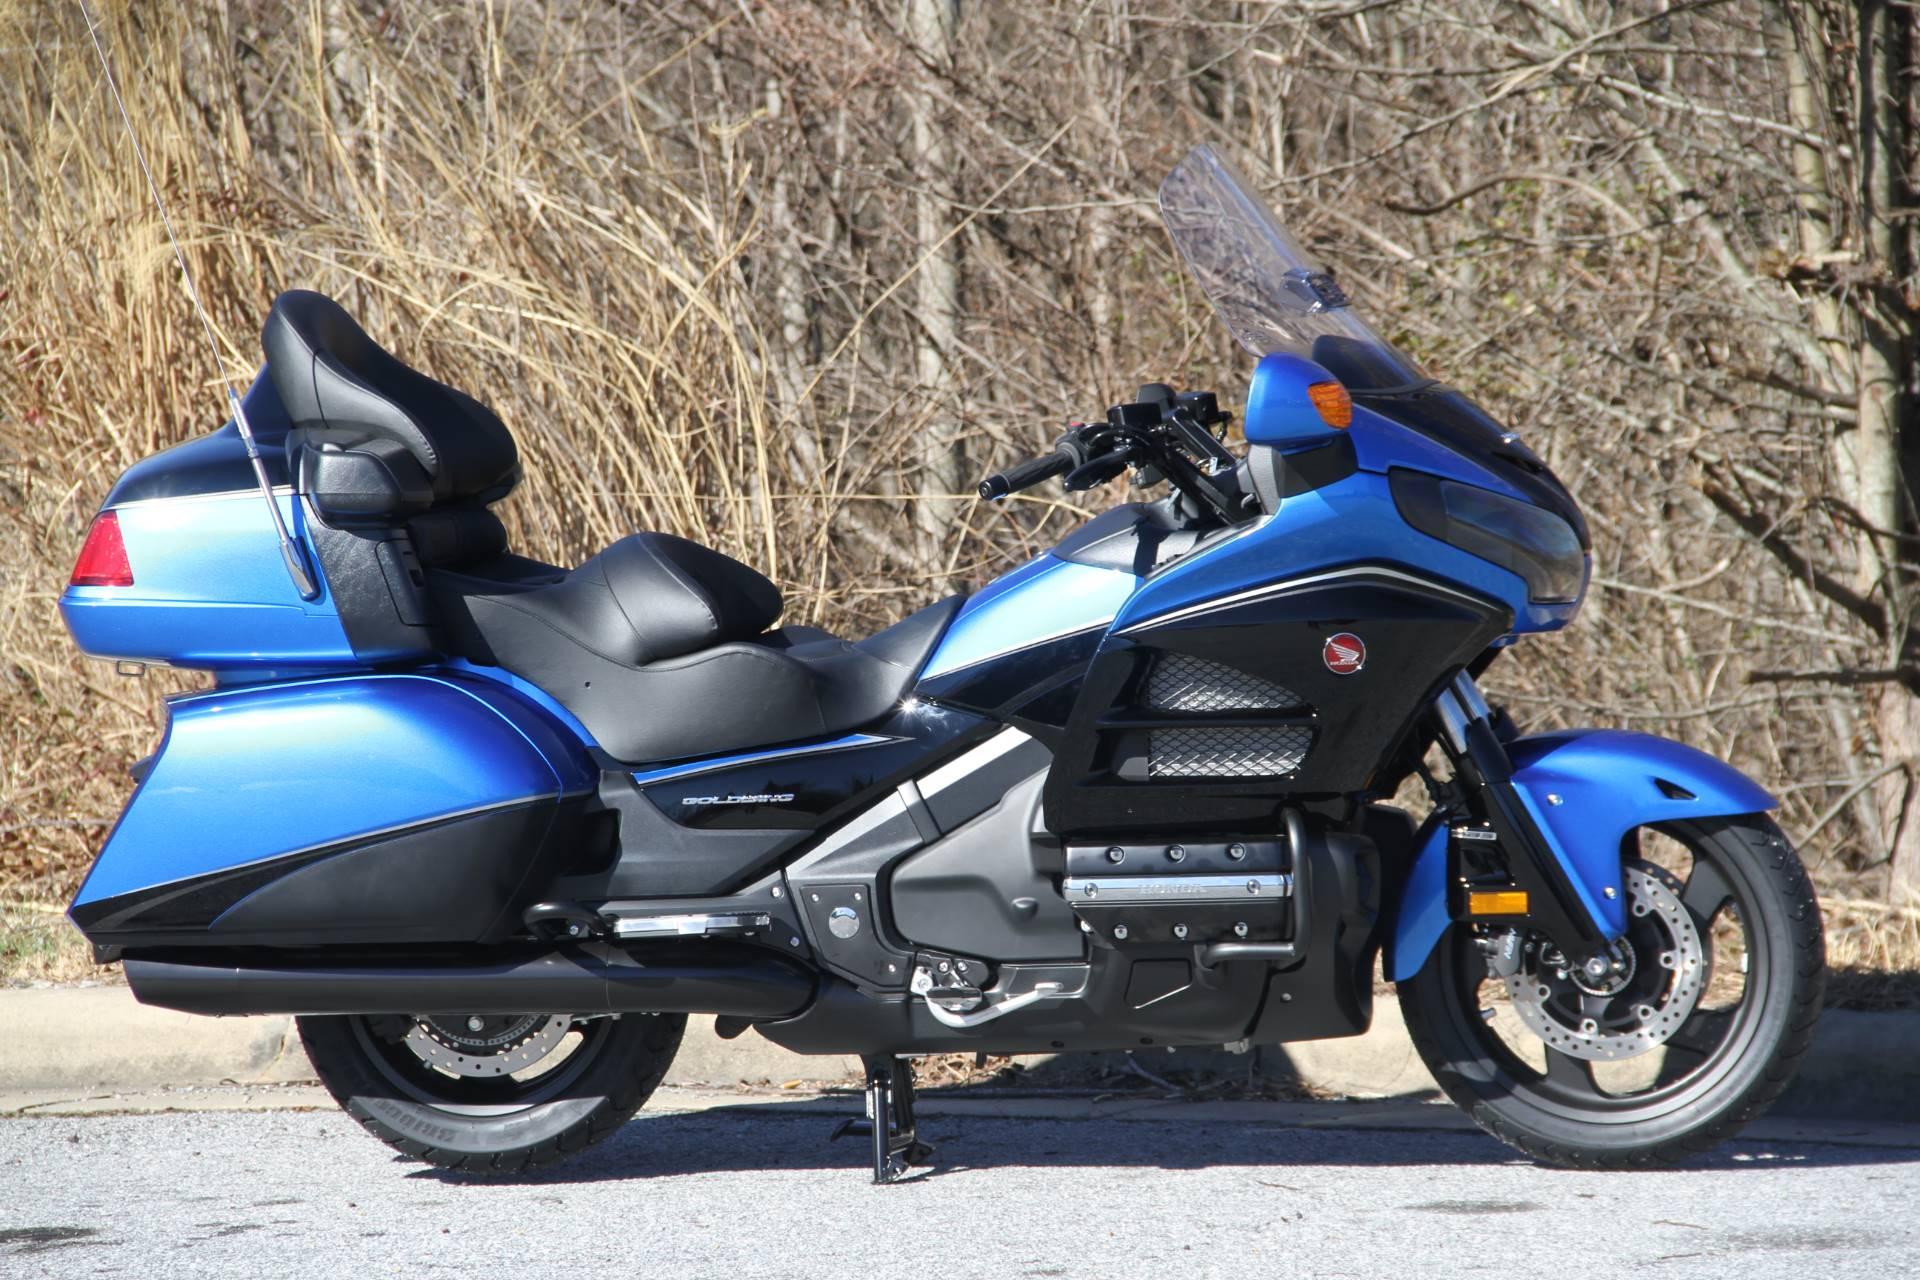 2017 Honda Gold Wing Audio Comfort Navi XM ABS in Hendersonville, North Carolina